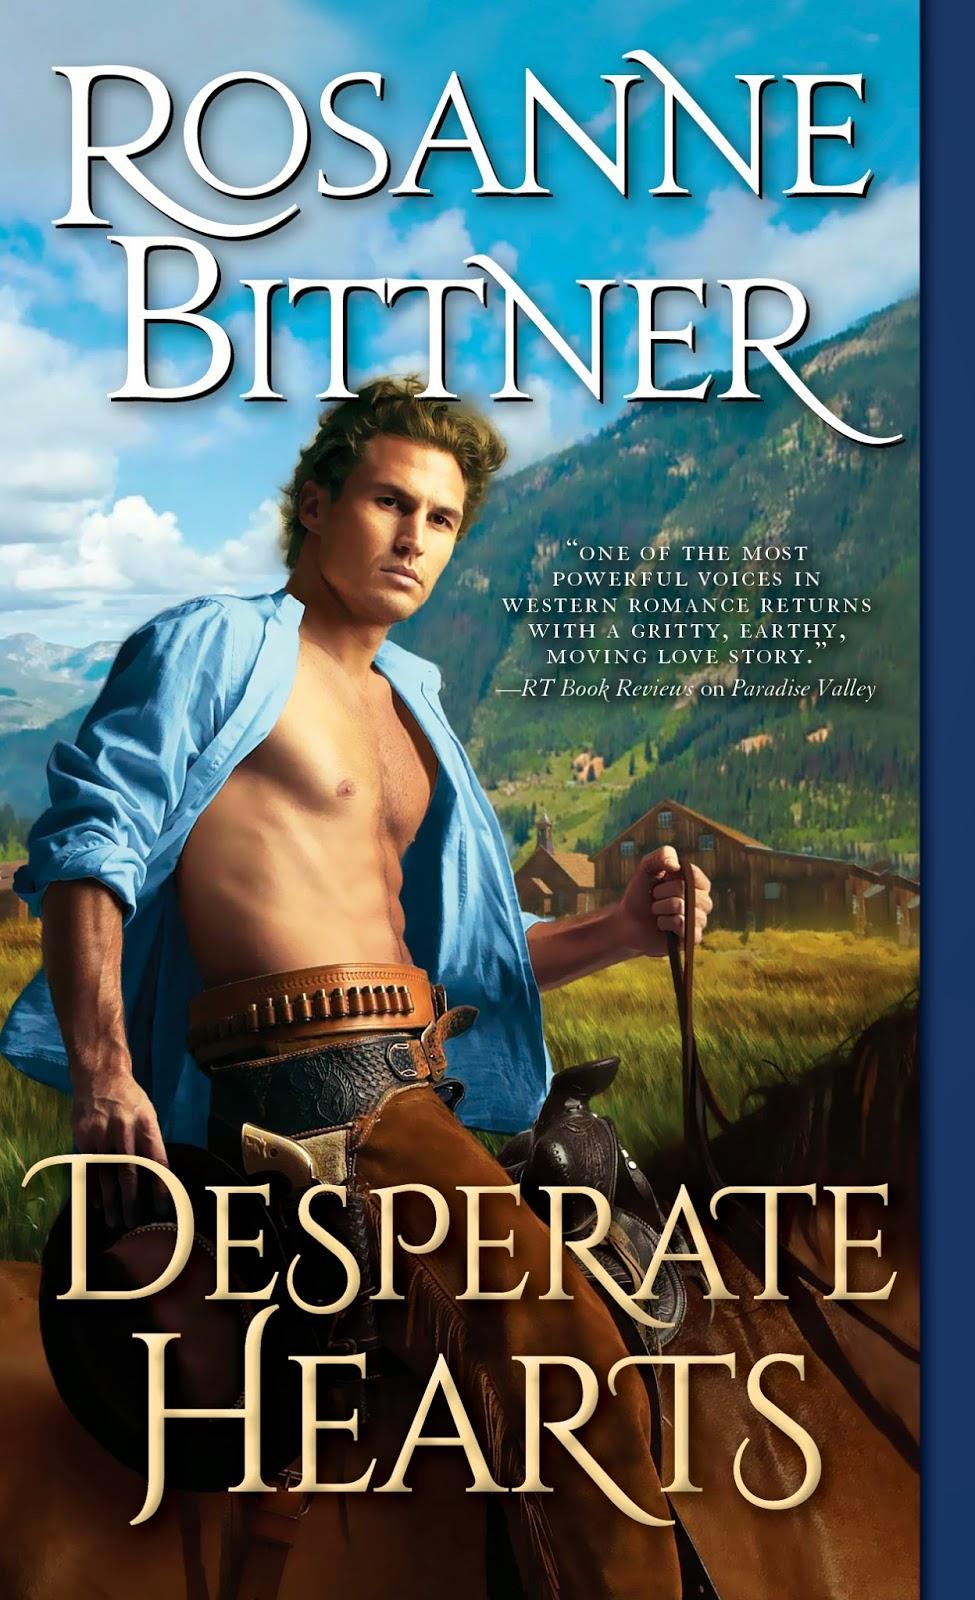 What's In A Hero? | Rosanne Bittner